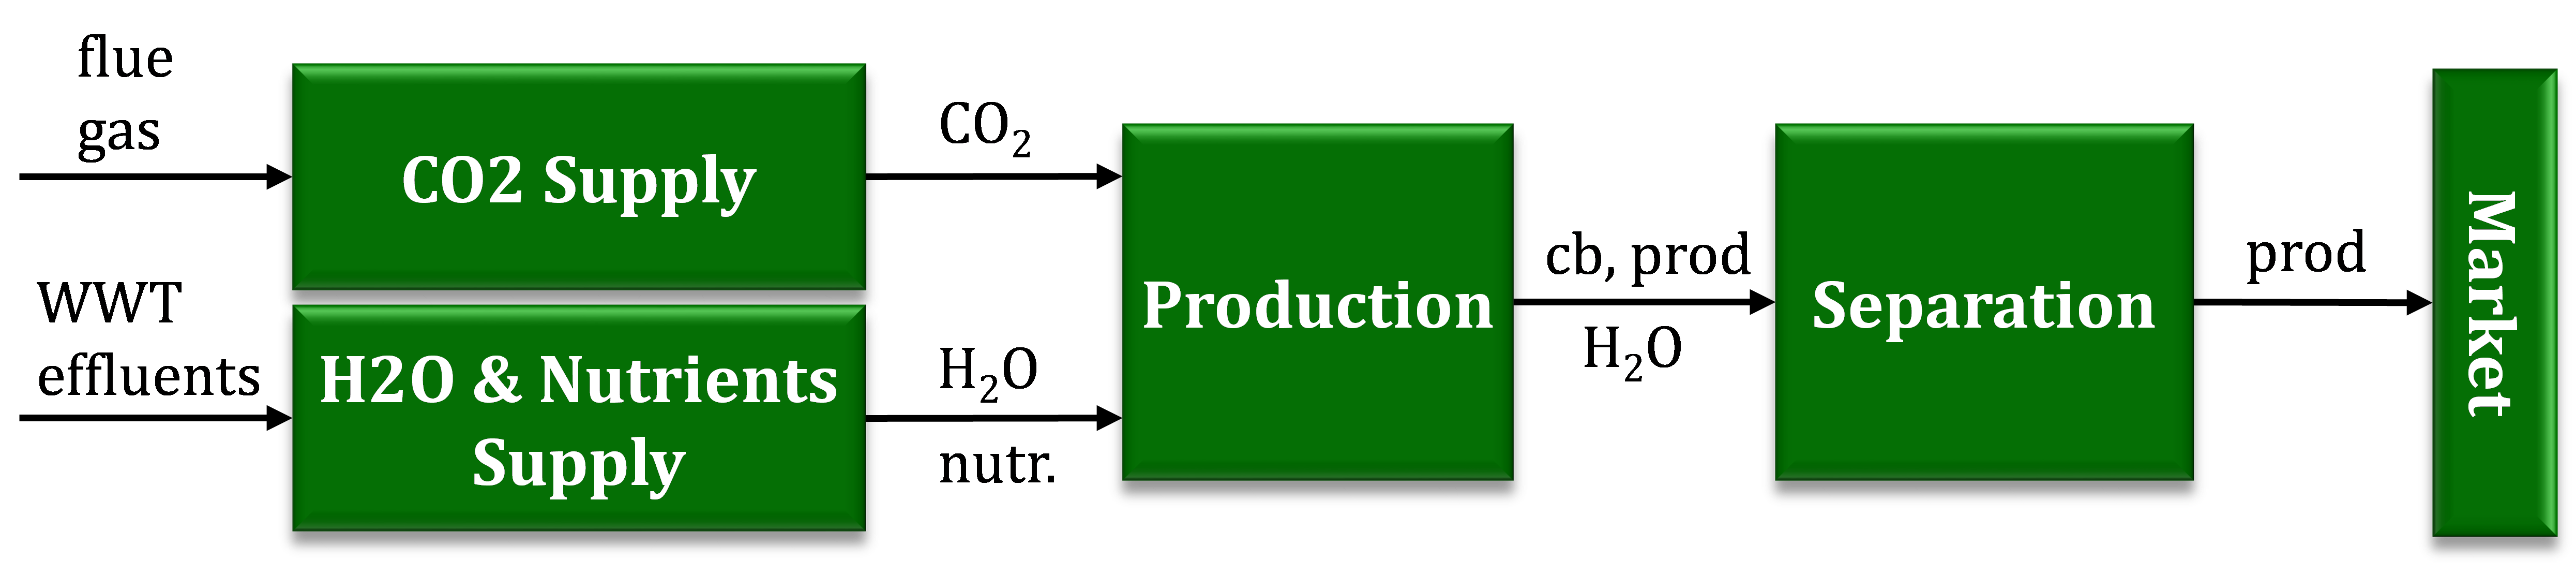 Figure 1. Cyanobacterial biorefinery system. WWT = waste water treatment; cb = cyanobacteria; prod = product; nutr. = nutrient.